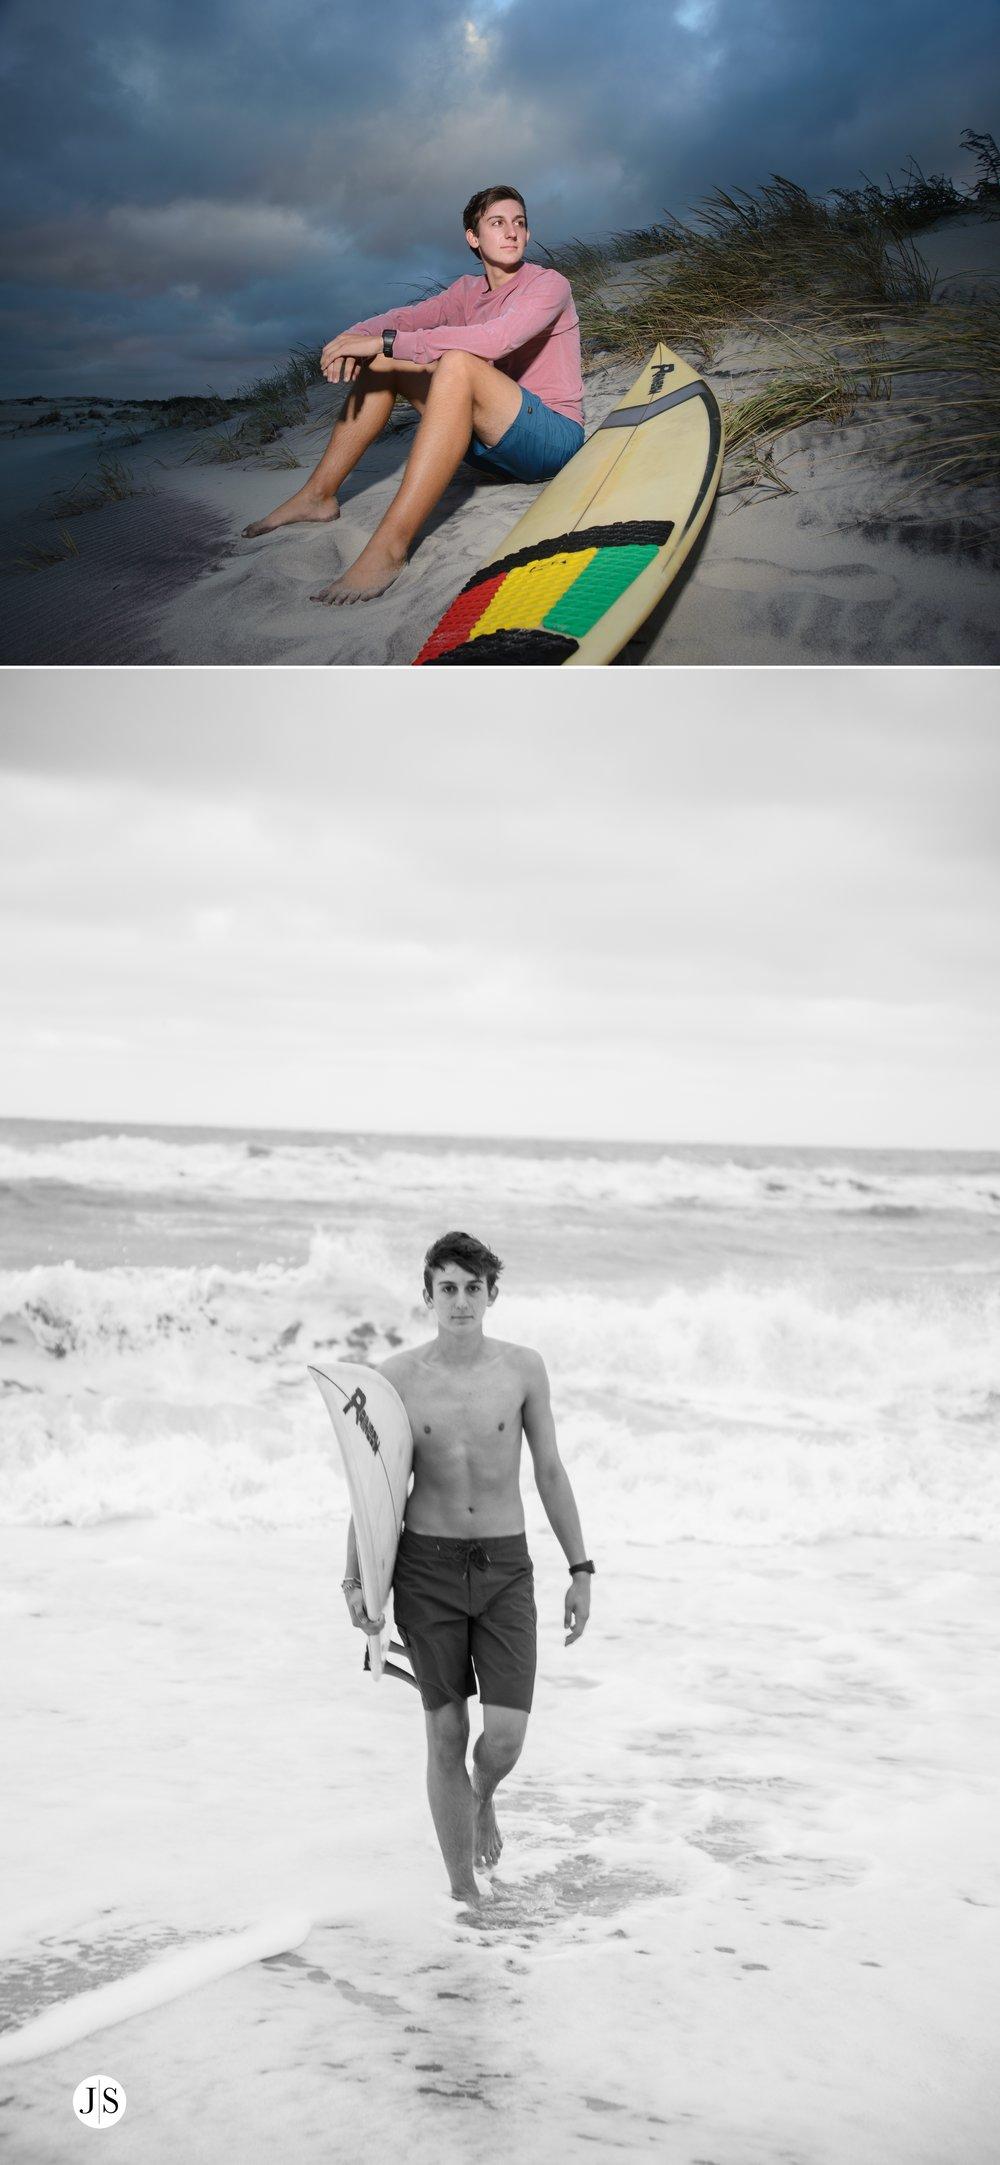 senior-portrait-salisbury-maryland-portraits-beach-assateague-jeep-surfing-belin-downtown-photo 9.jpg